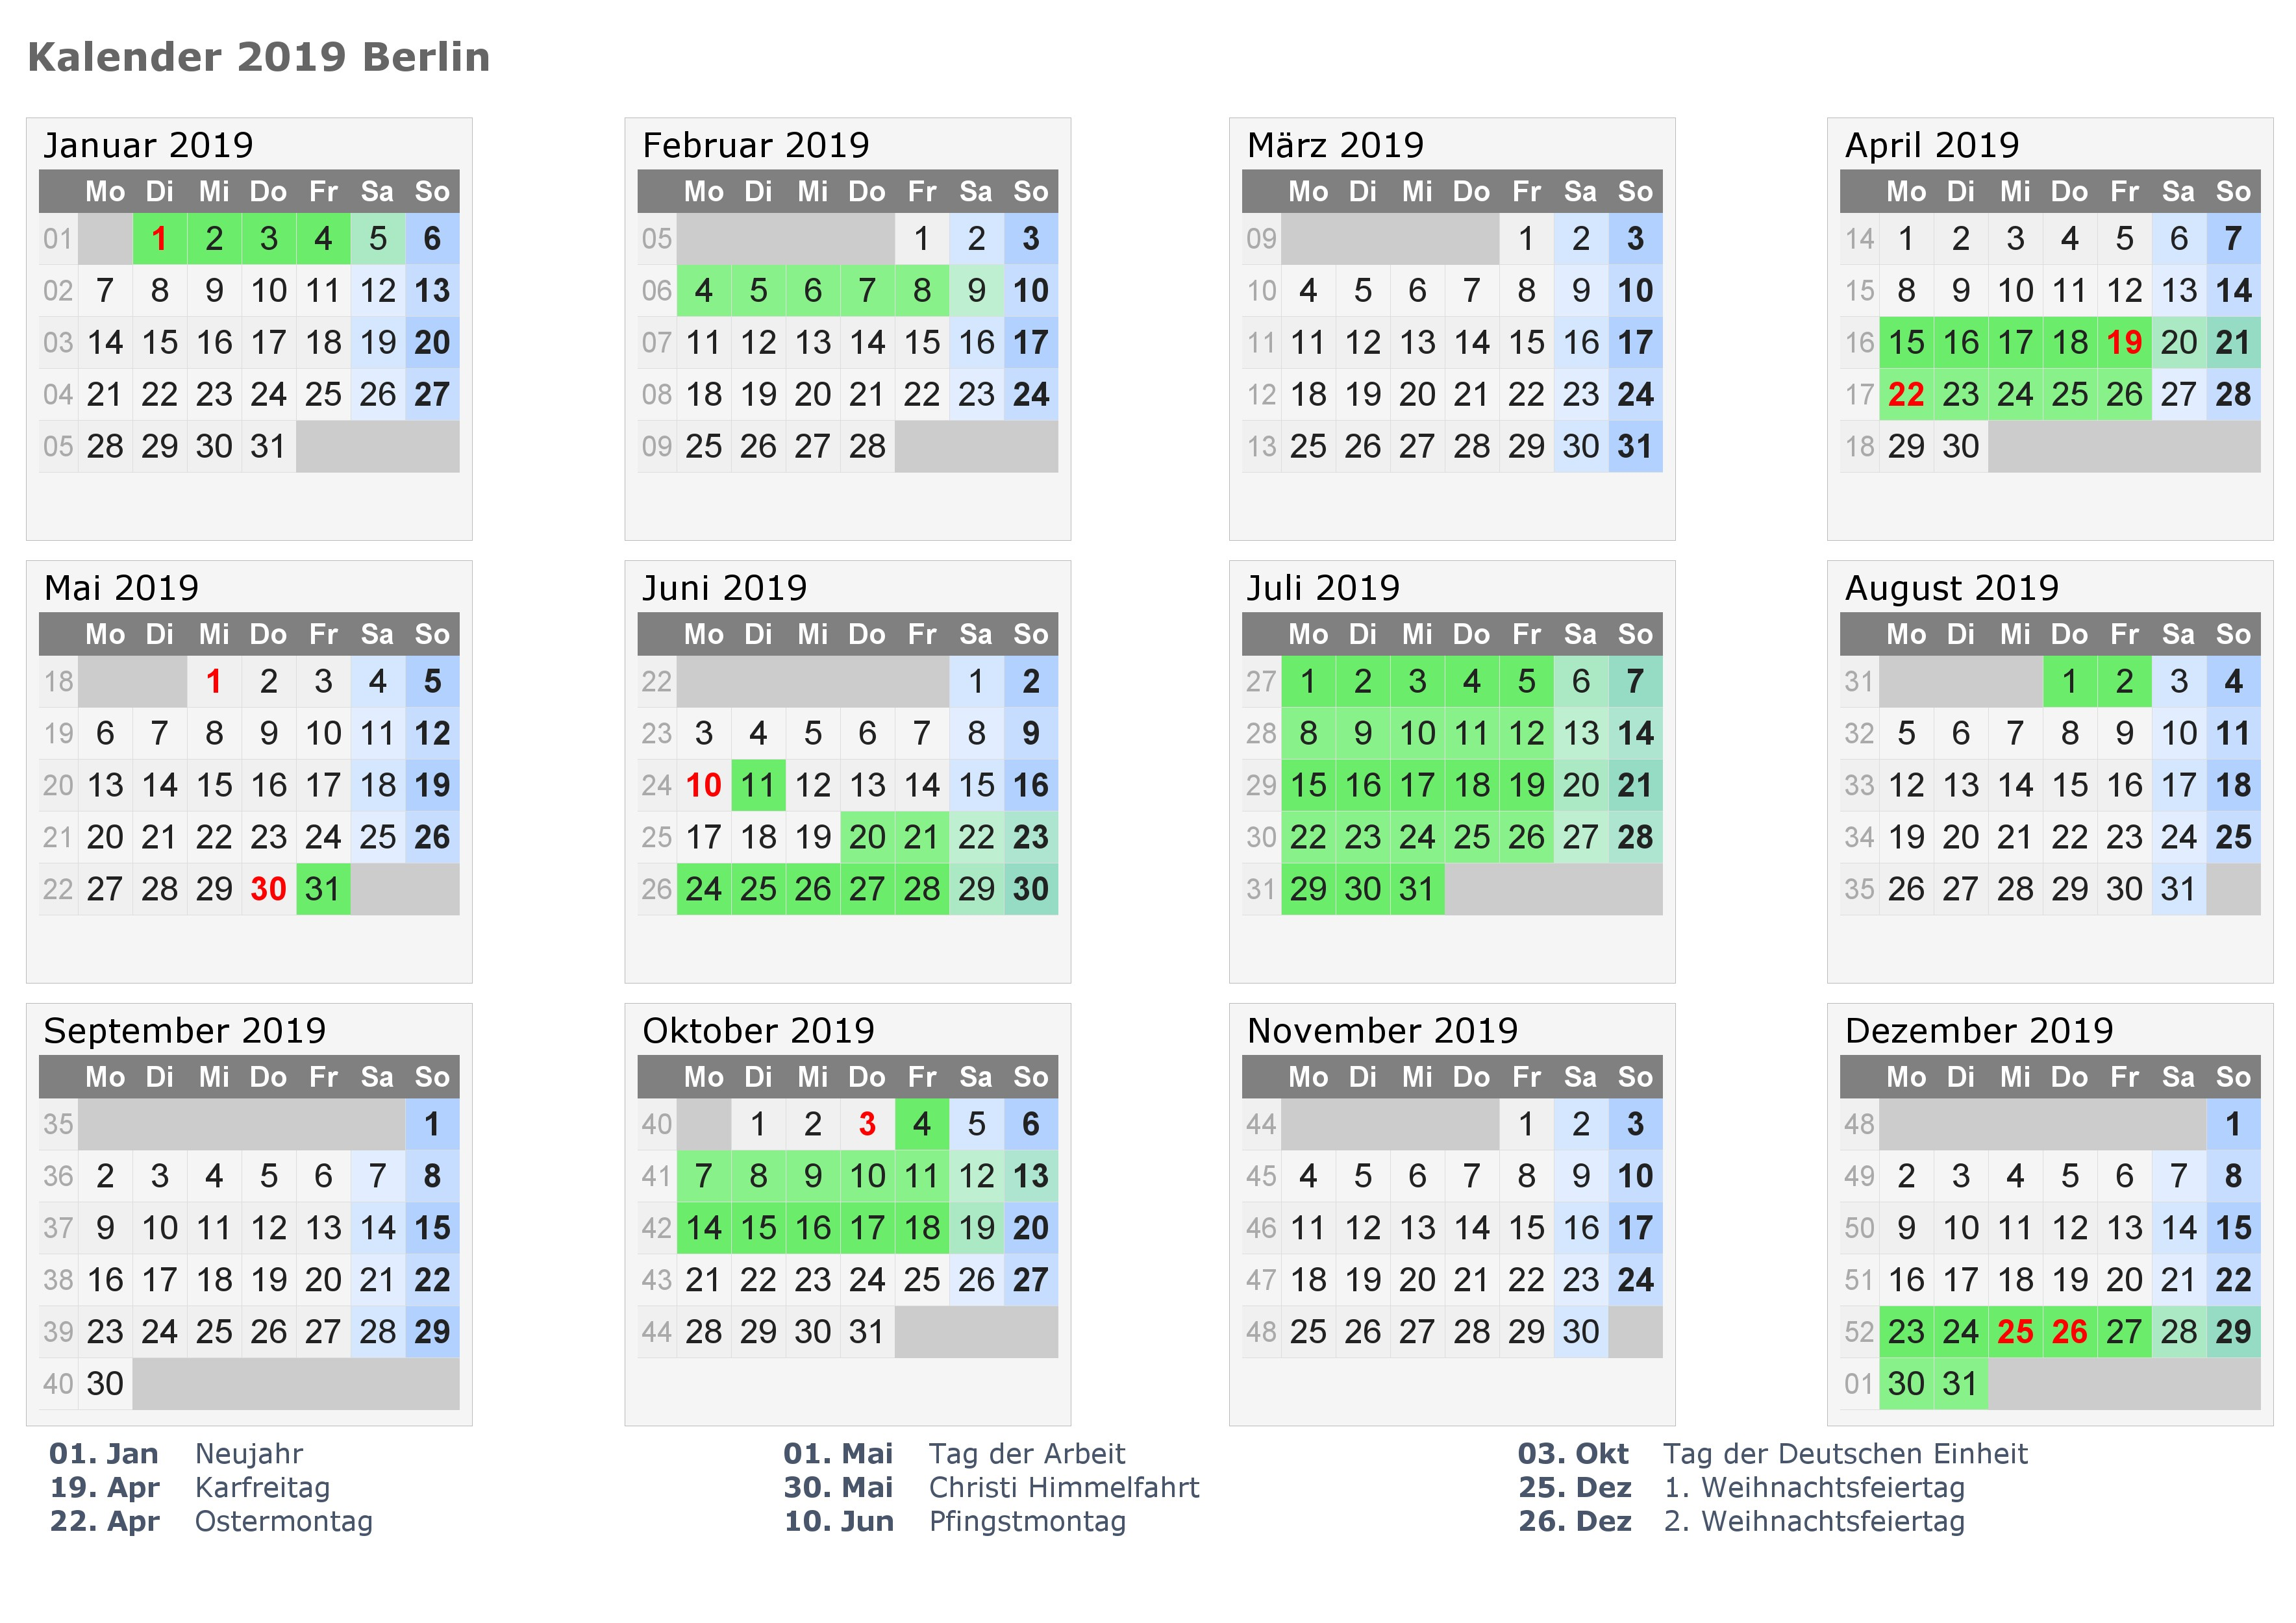 Kalender 2019 Excel Vorlagen Recientes Kalender 2019 Berlin [pdf Excel Word] Of Kalender 2019 Excel Vorlagen Actual Microsoft Excel Calendar 2014 Template Unique Projektplan Excel